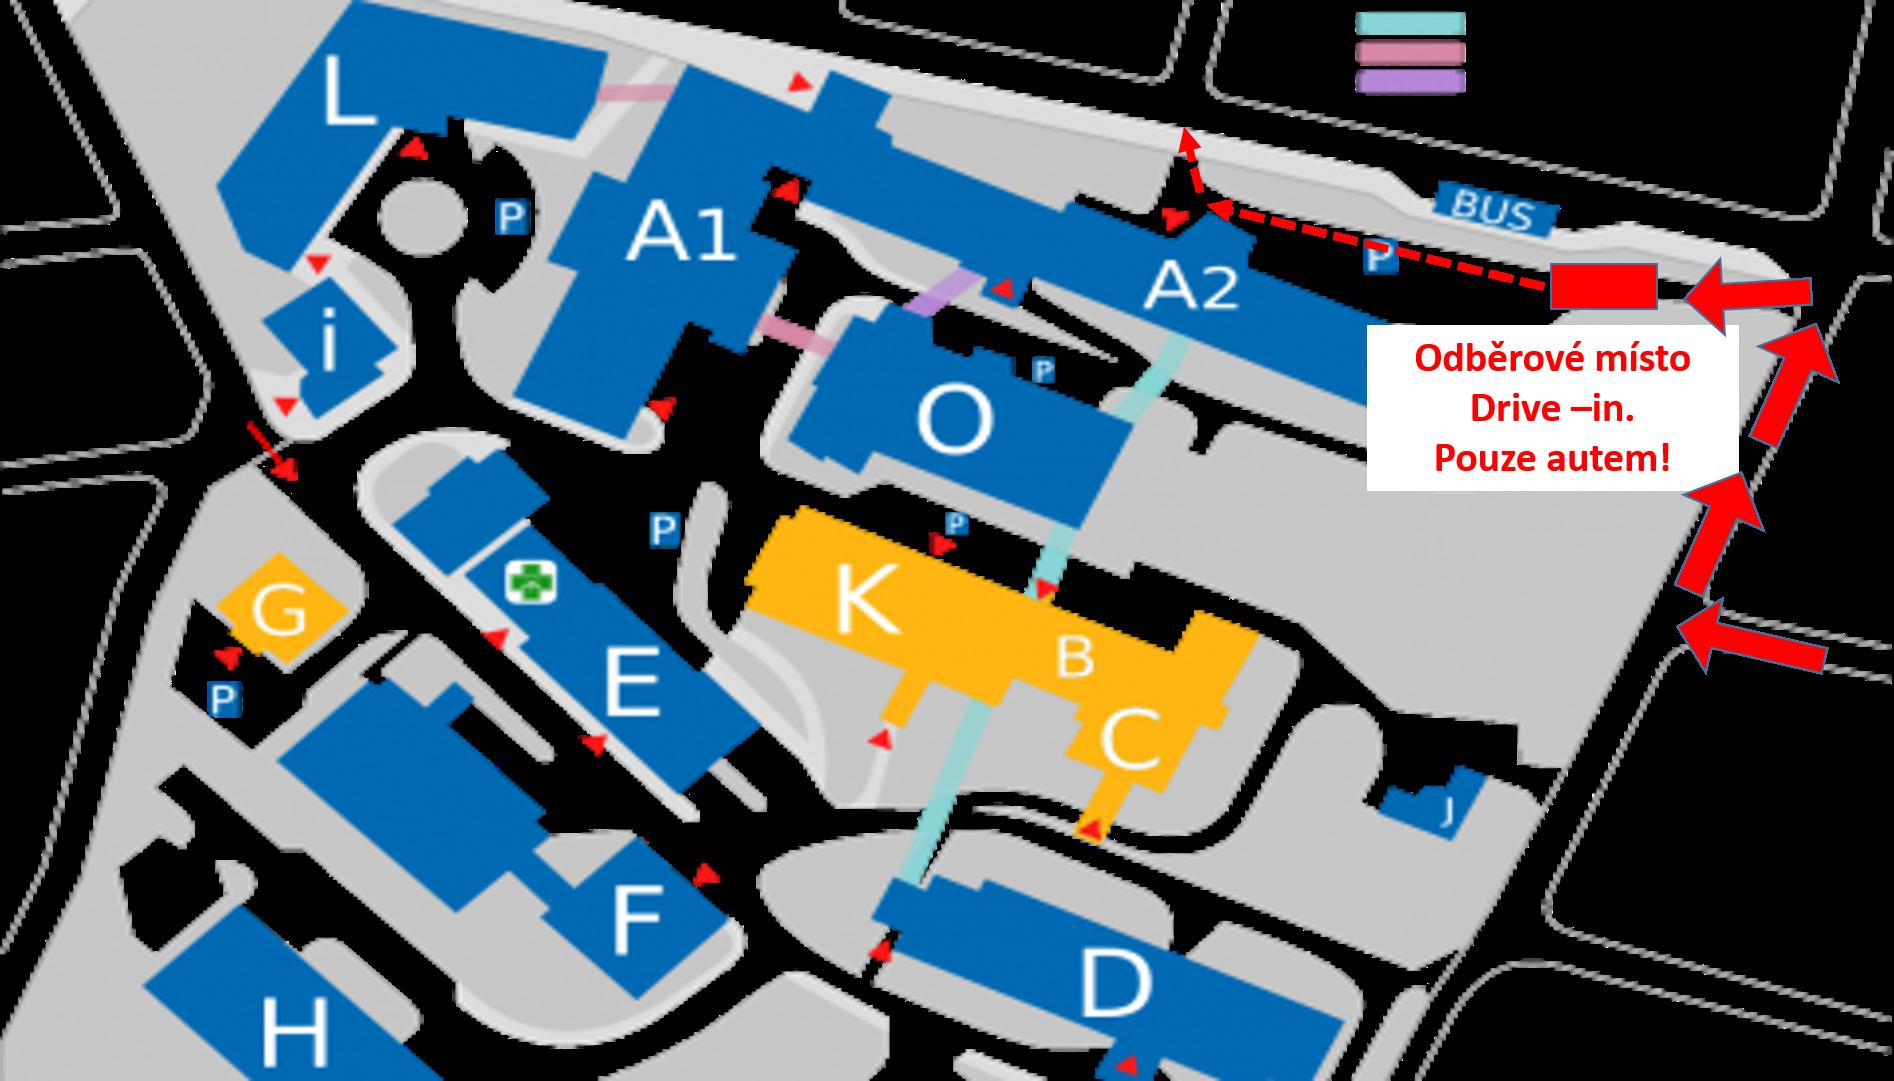 Obrázek na adrese http://www.nemtru.cz/sites/default/files/212/articles/field_images/odberove_misto_ocvid-19_mapa.png